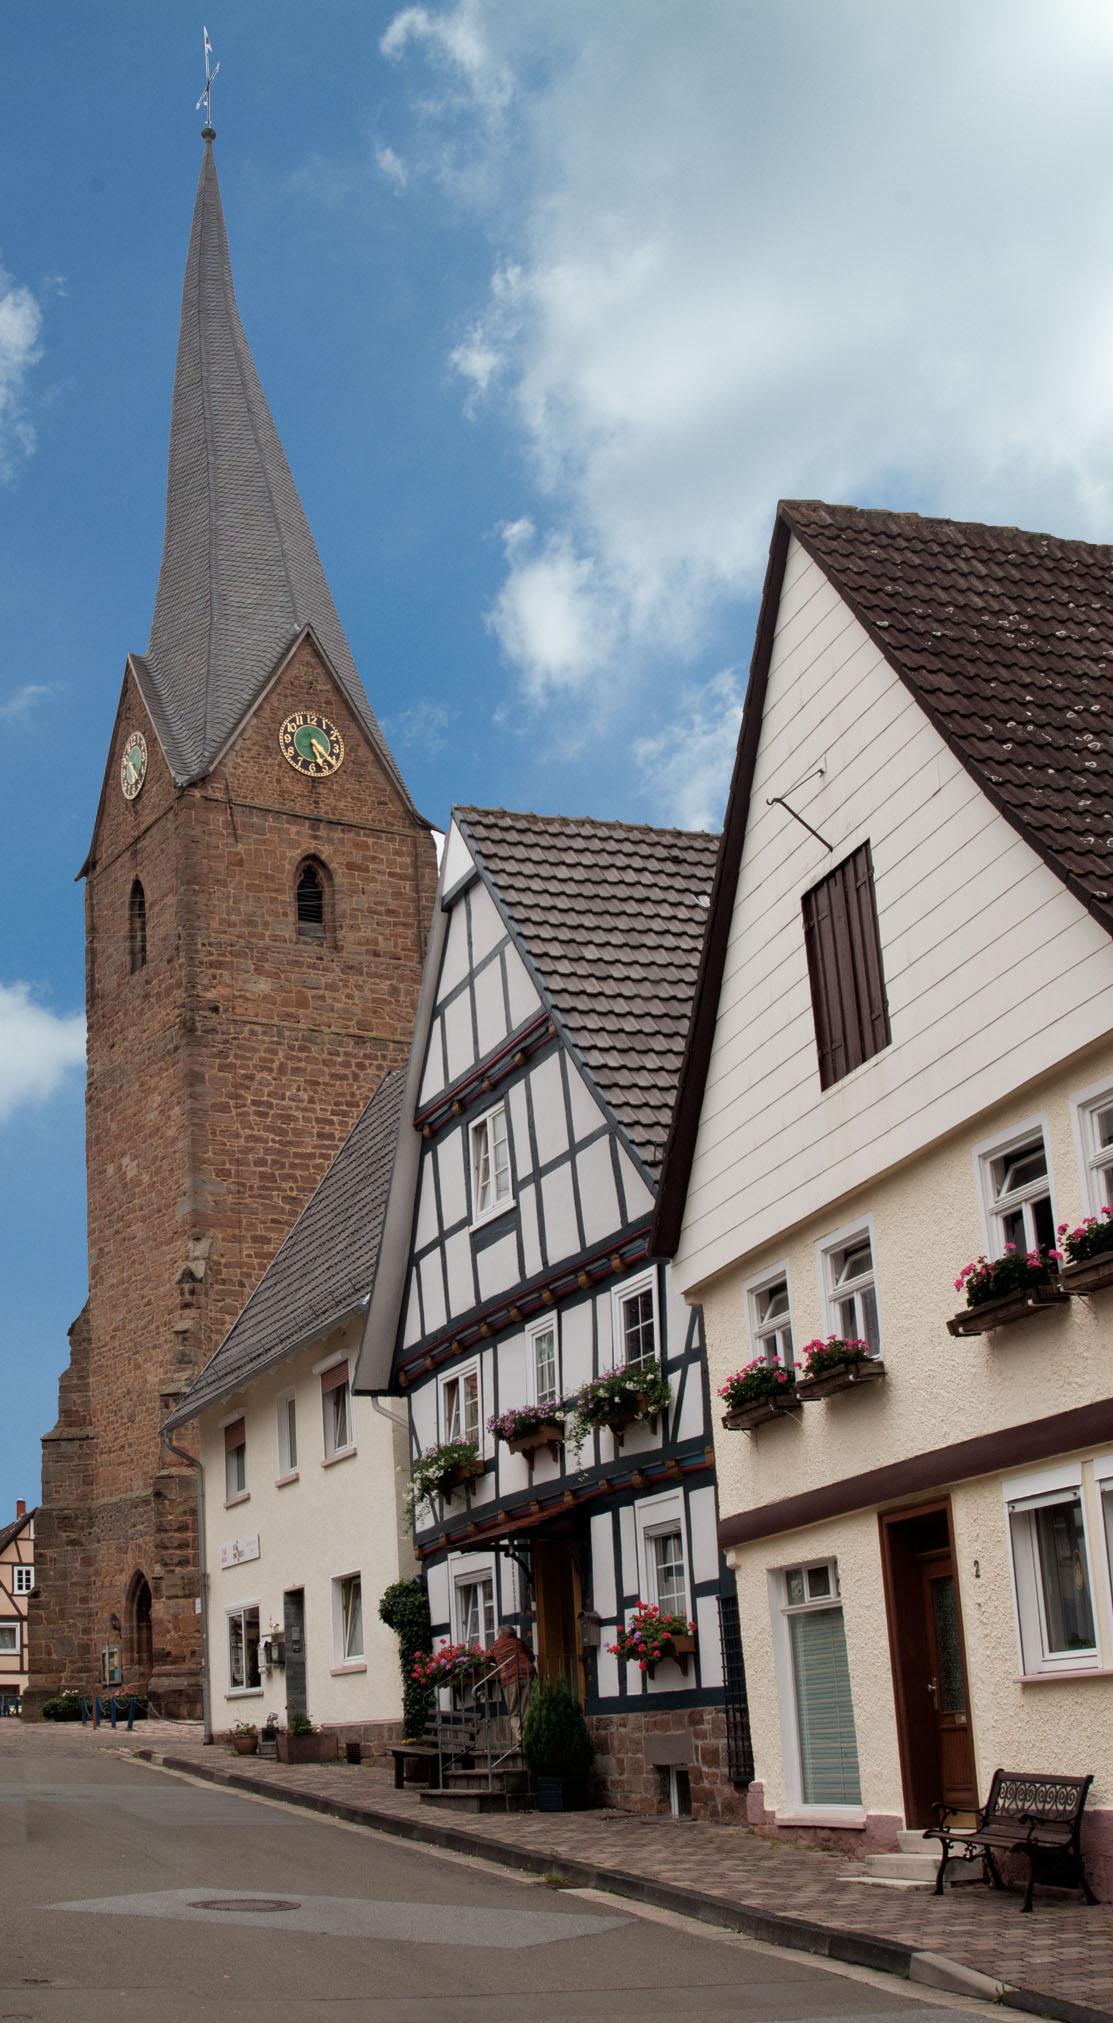 Fachwerkstadt Mengeringhausen mit St.Georg-Kirche